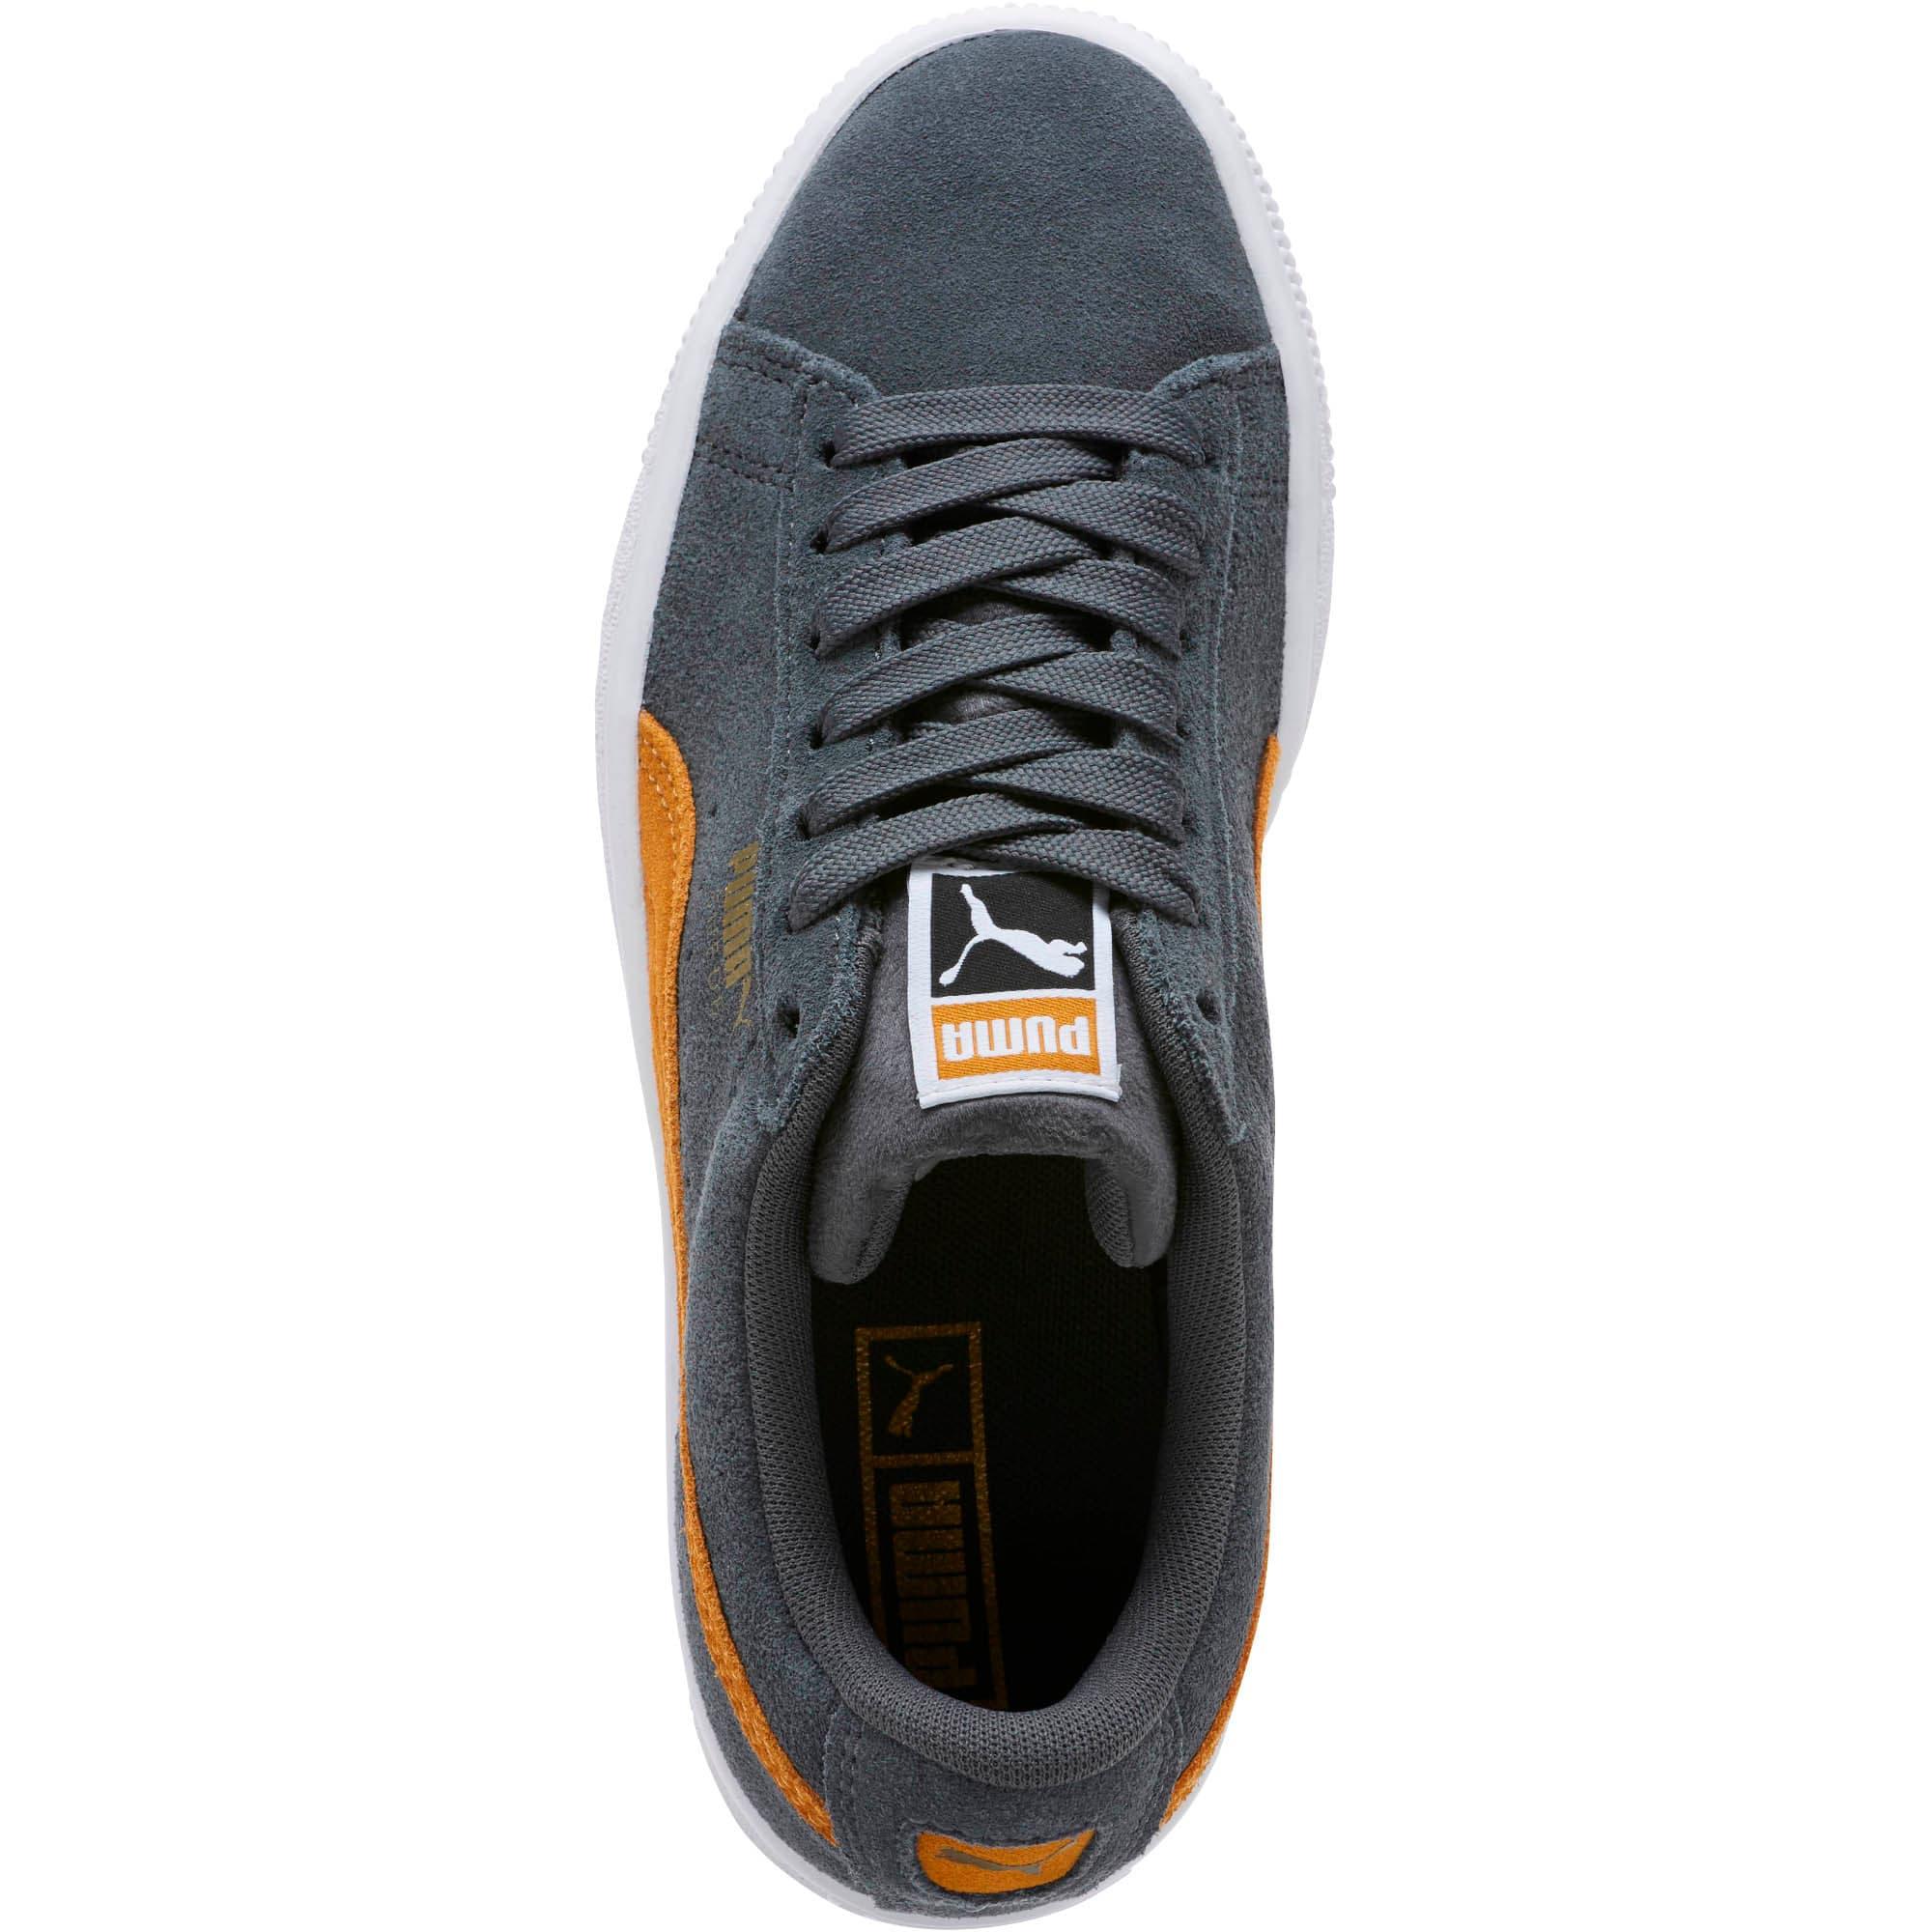 Thumbnail 5 of Suede Classic Sneakers JR, Iron Gate-Buckthorn, medium